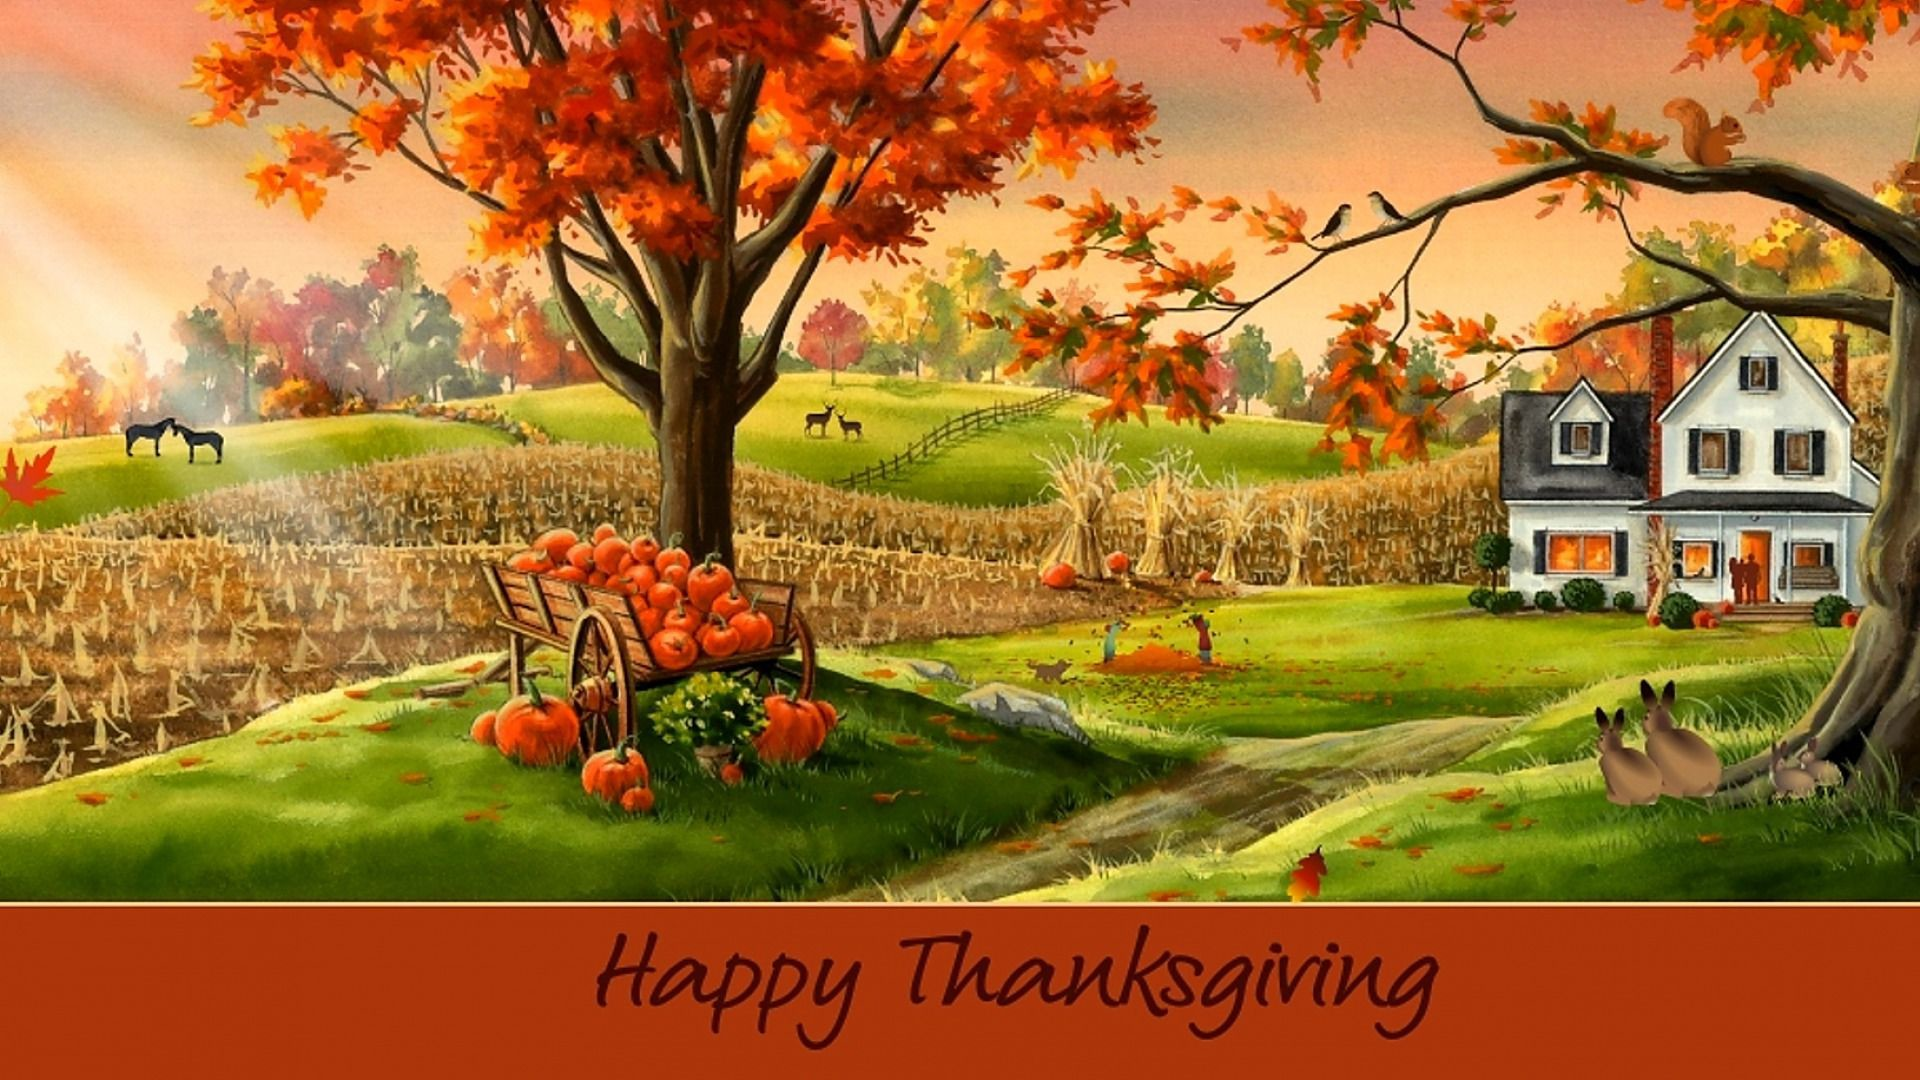 Res: 1920x1080, Desktop Nexus Home Thanksgiving Backgrounds.